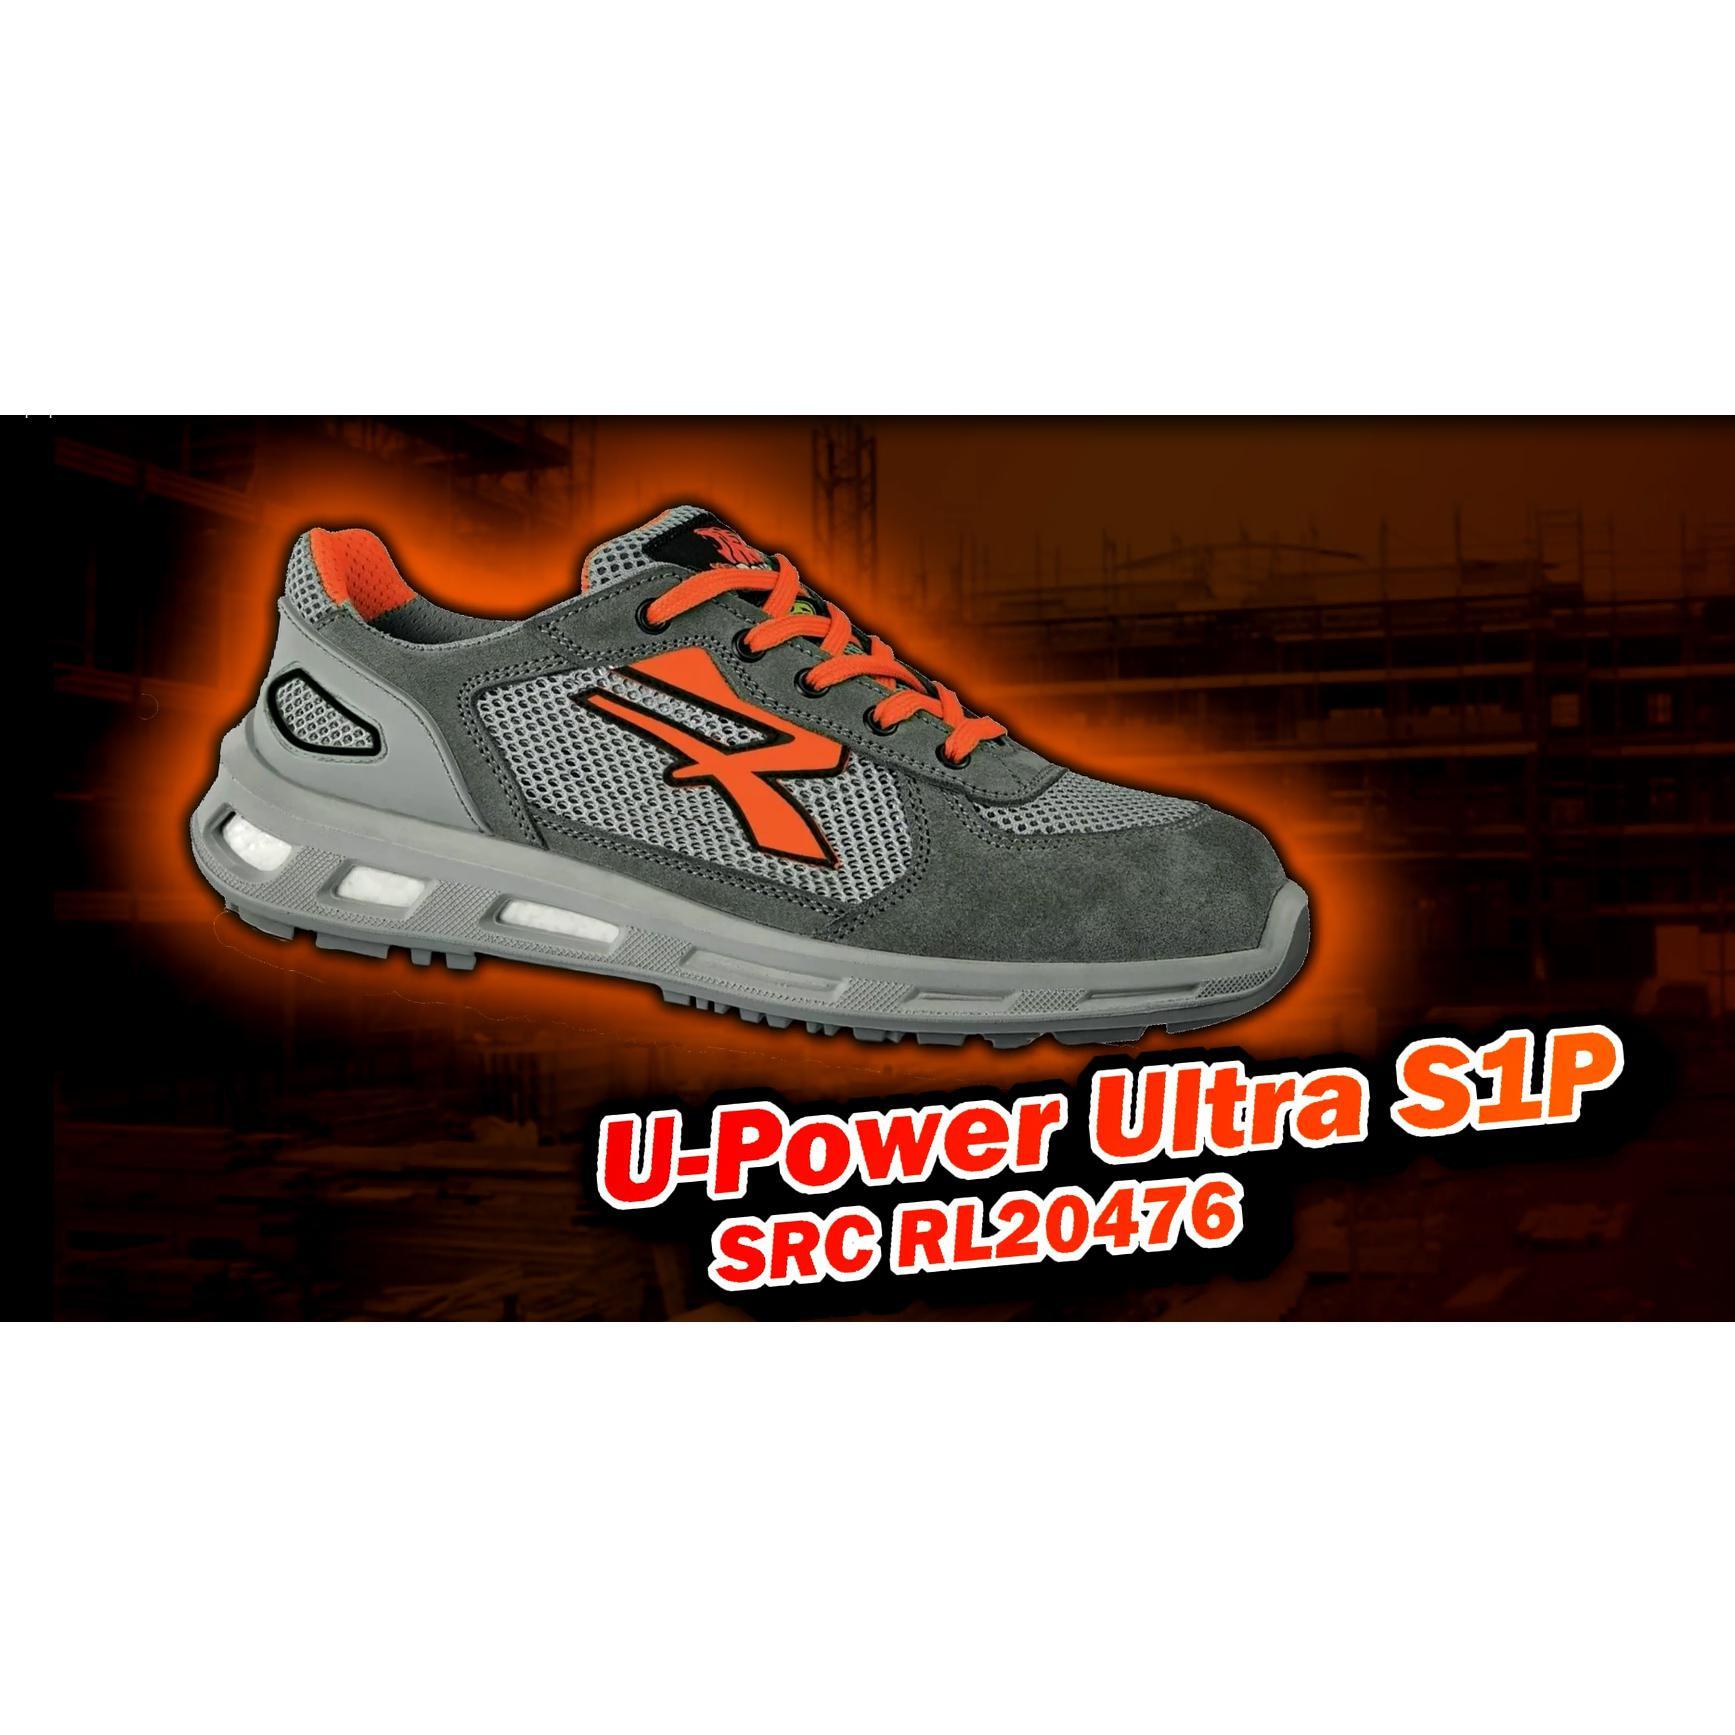 UPOWER SCARPE LAVORO ANTINFORTUNISTICA ULTRA S1P SRC ESD U-POWER RL20476 REDLION